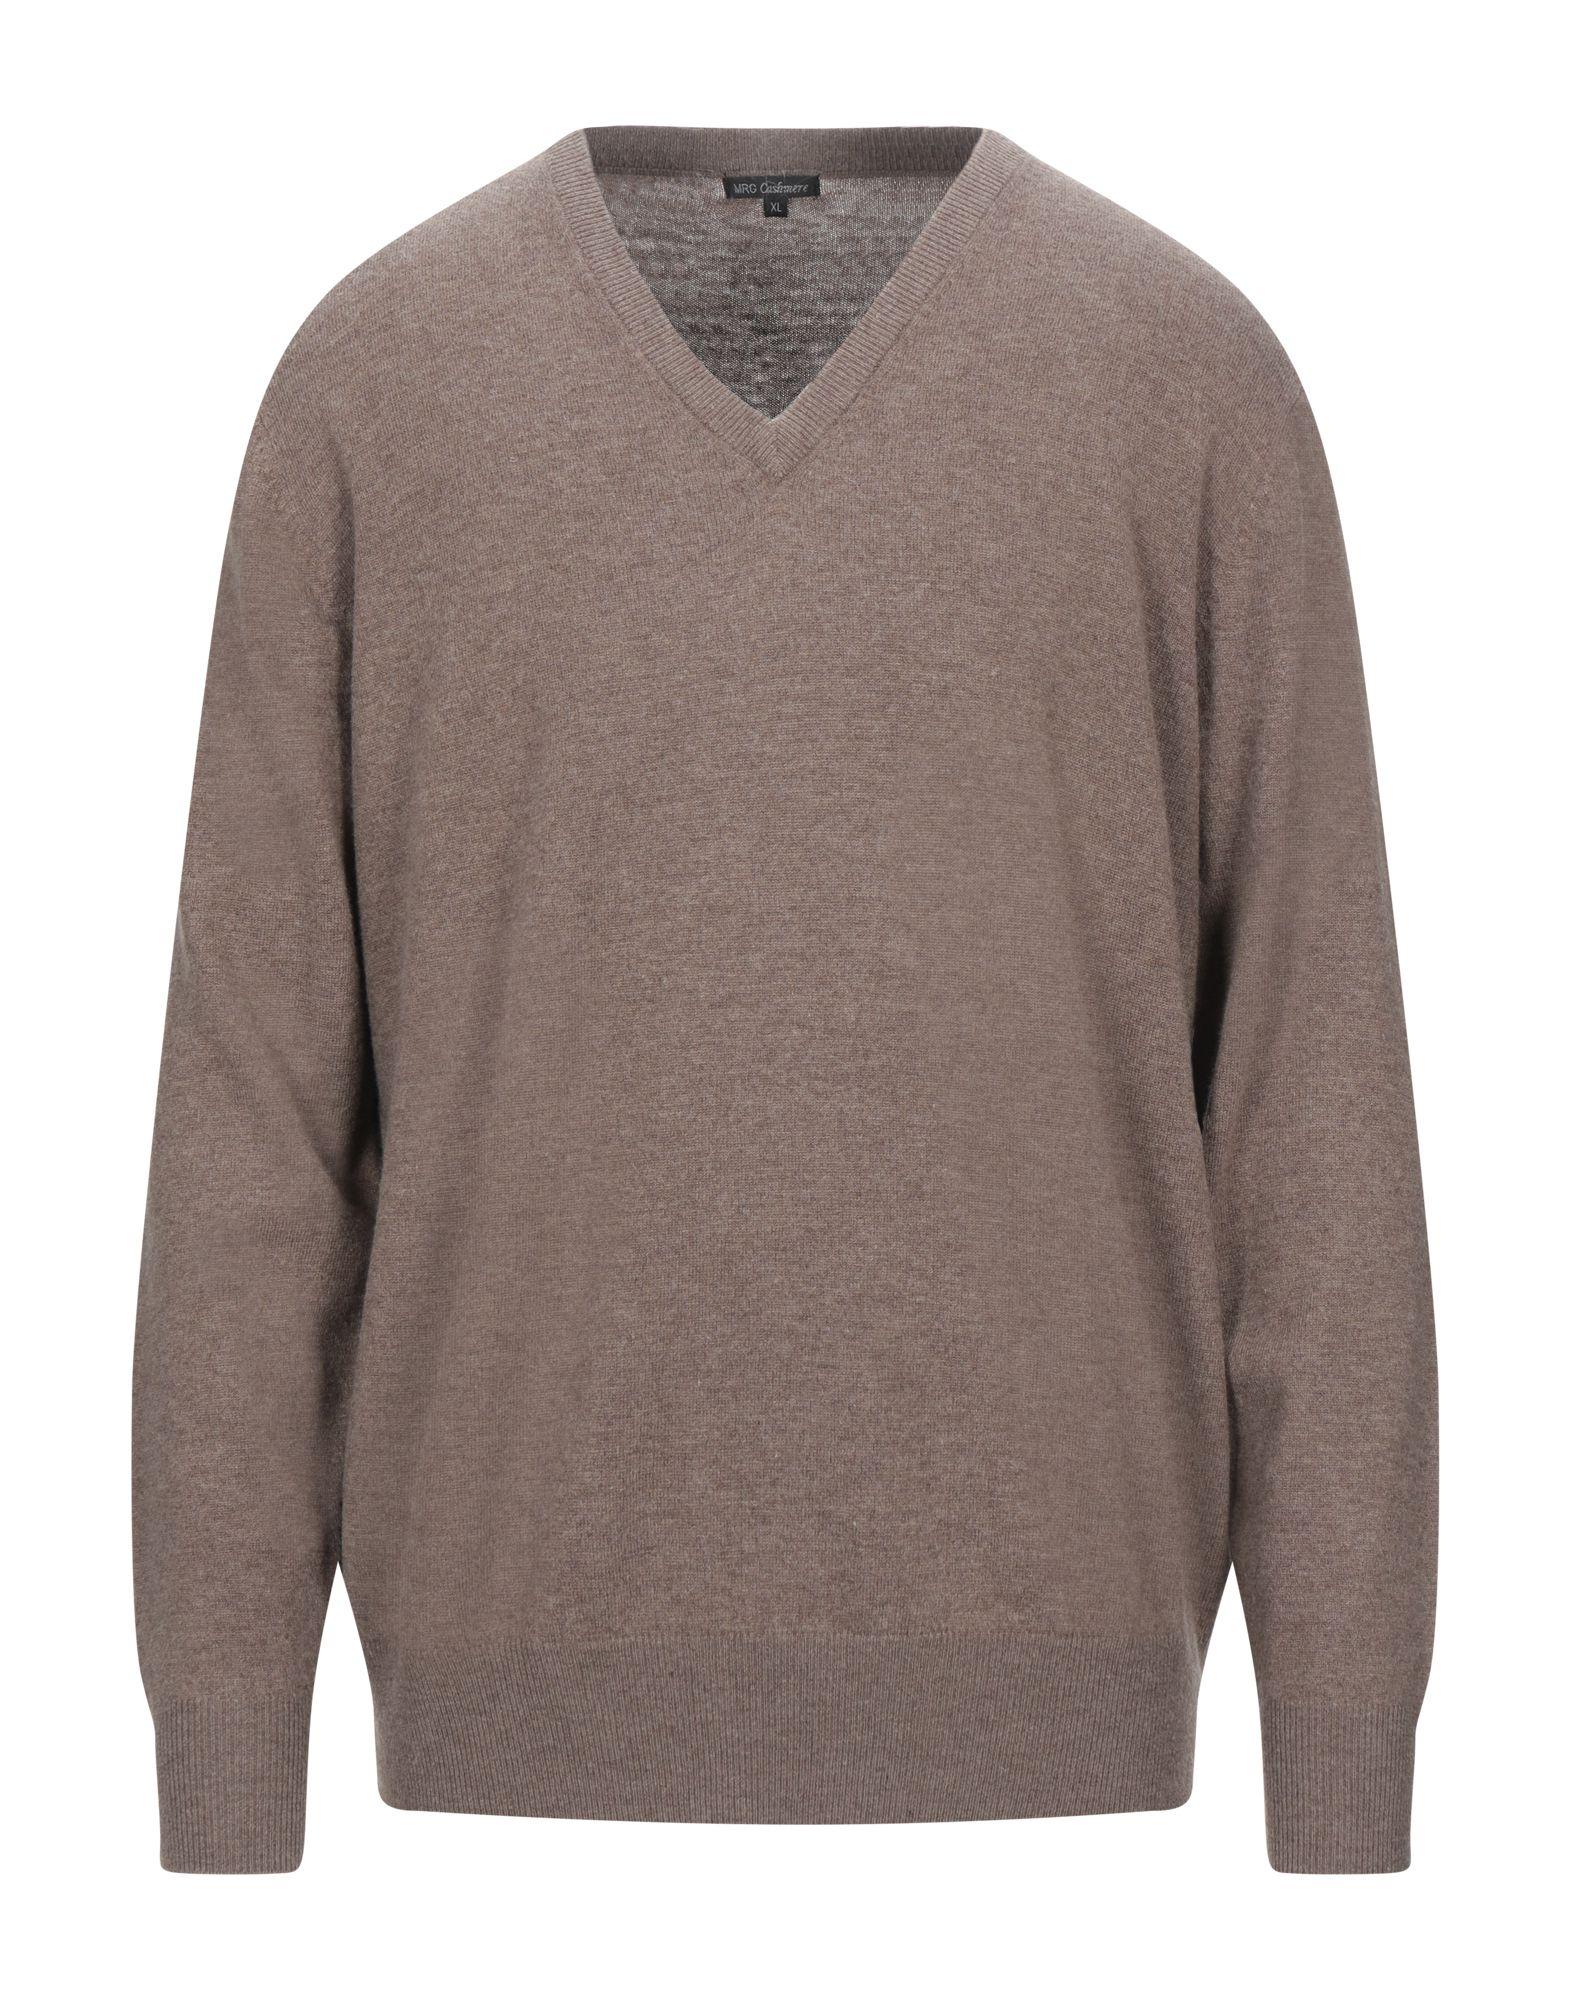 MRG CASHMERE Sweaters - Item 14061414